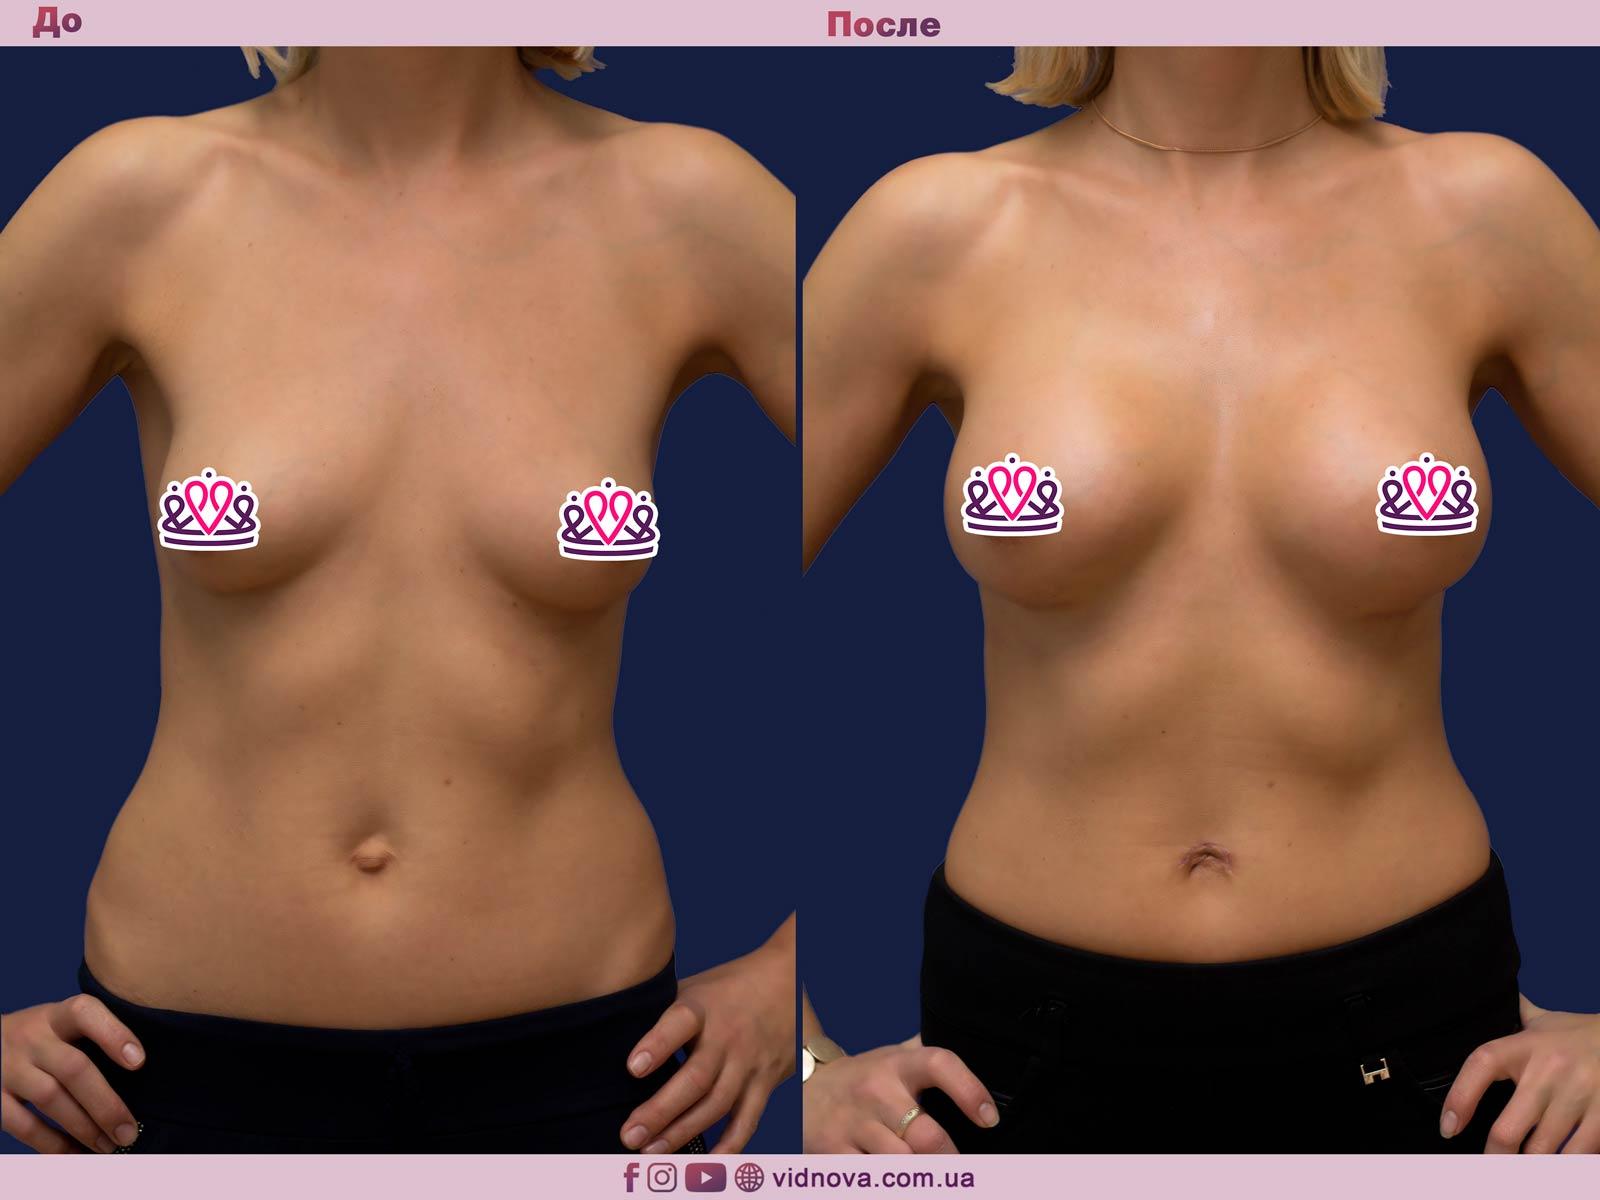 Увеличение груди: Фото ДО и ПОСЛЕ - Пример №75-1 - Клиника Vidnova